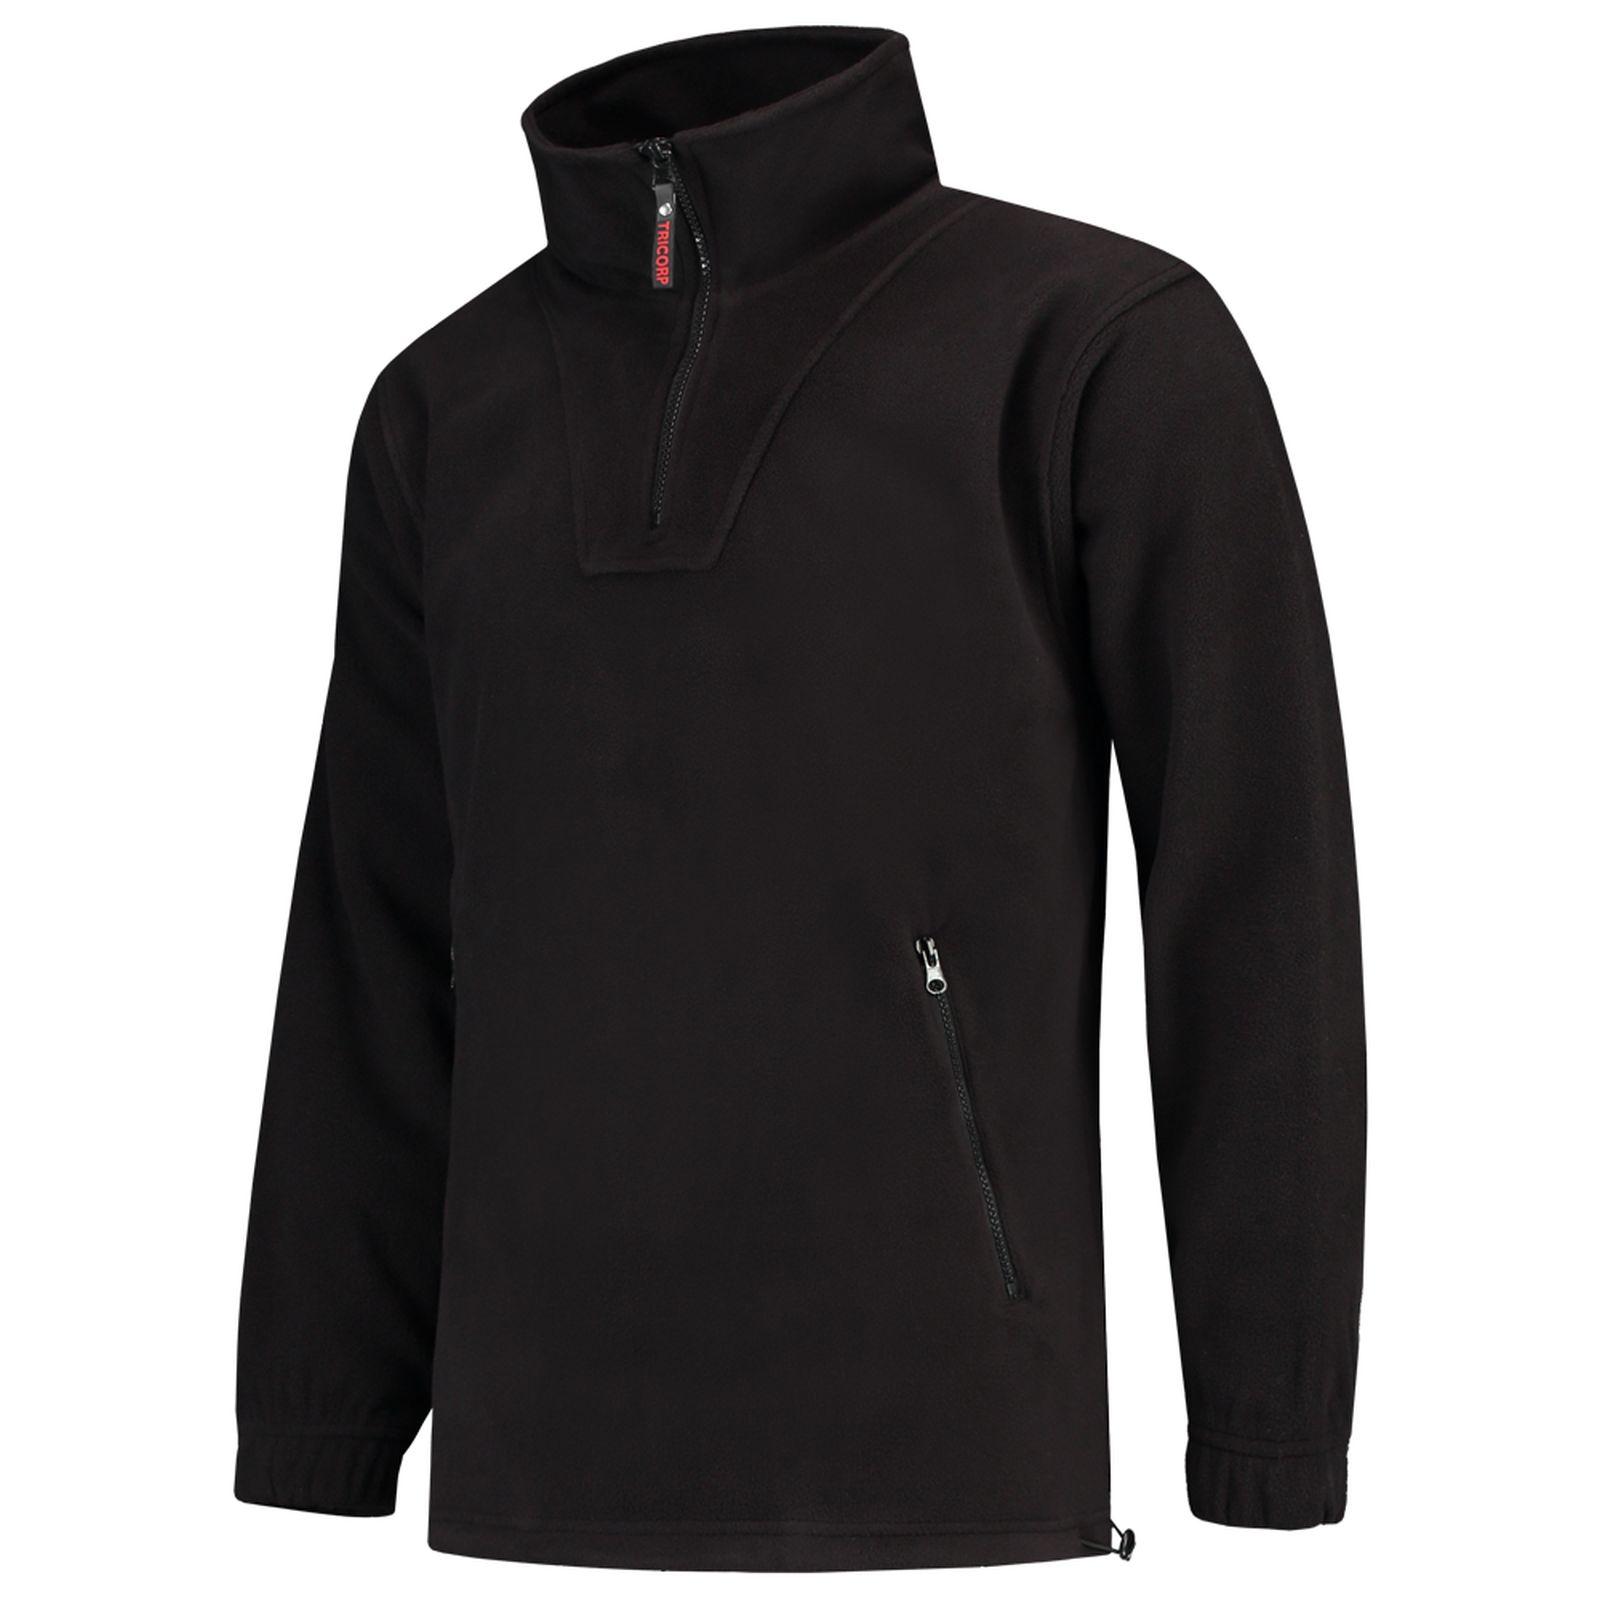 Tricorp Casual Truien 301001-FL320 zwart(Black)